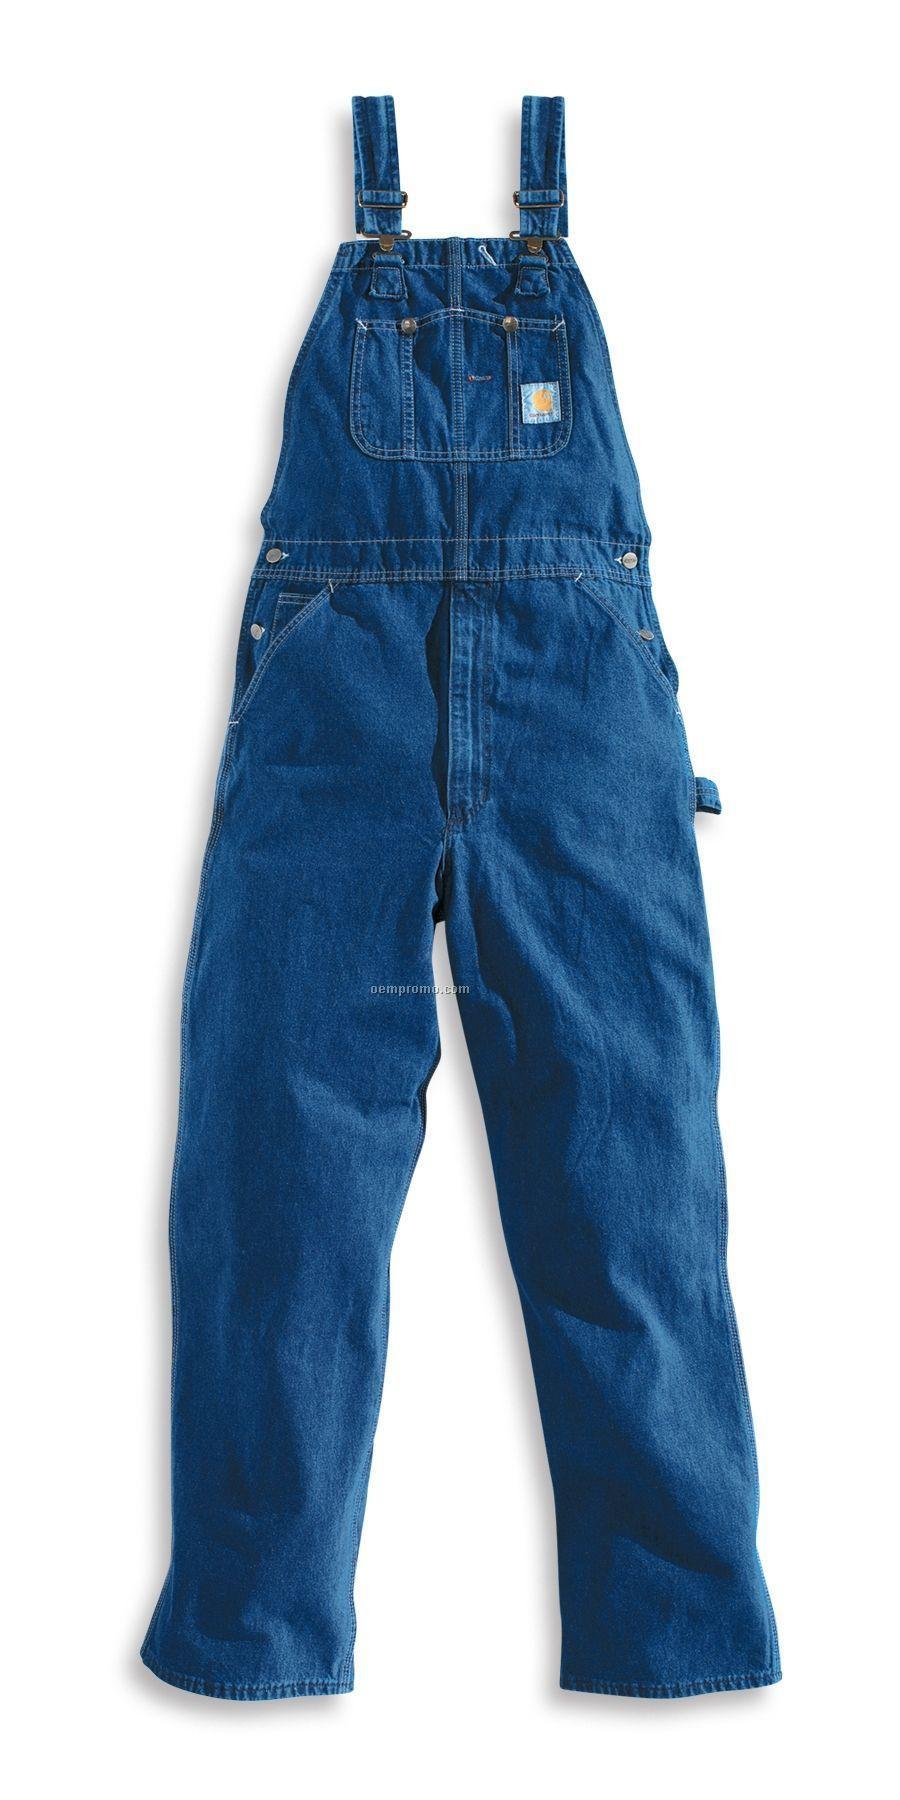 Carhartt Men's Washed Denim Bib Overall/ Unlined